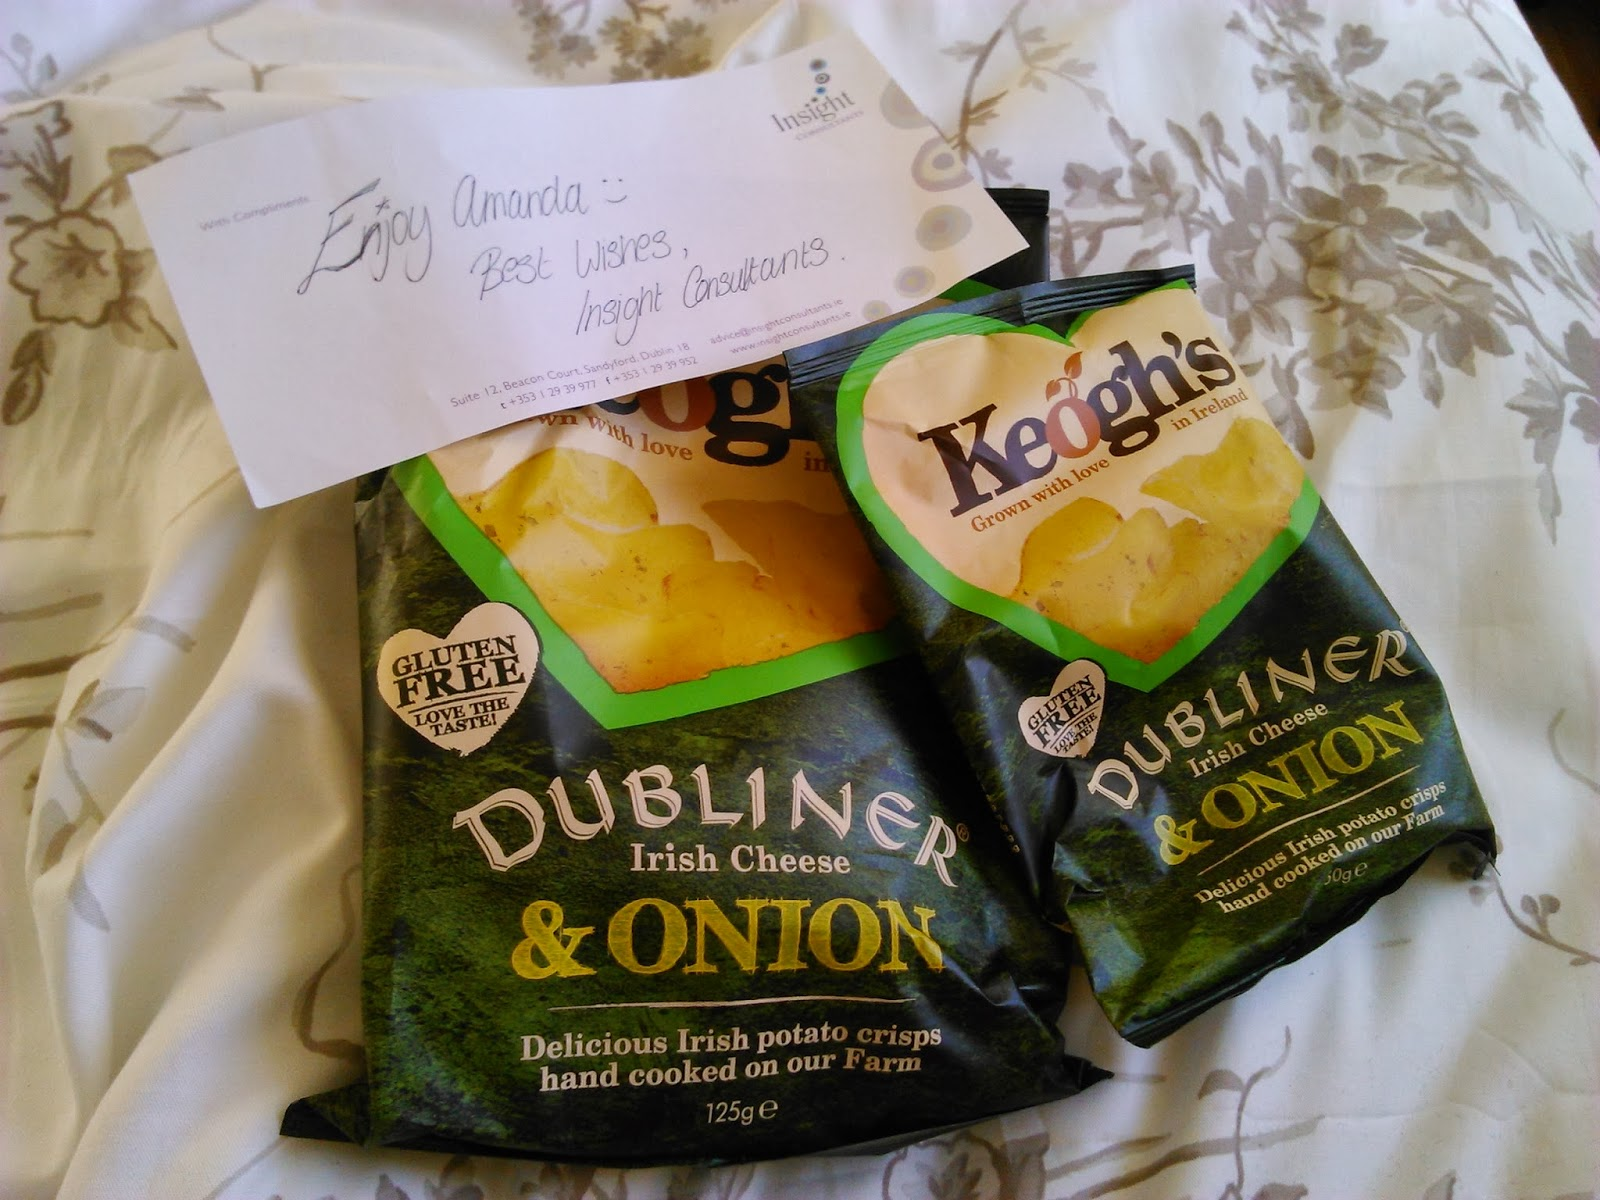 ... crisp sandwich post that here at Dublin Gluten Free we're crisp fans